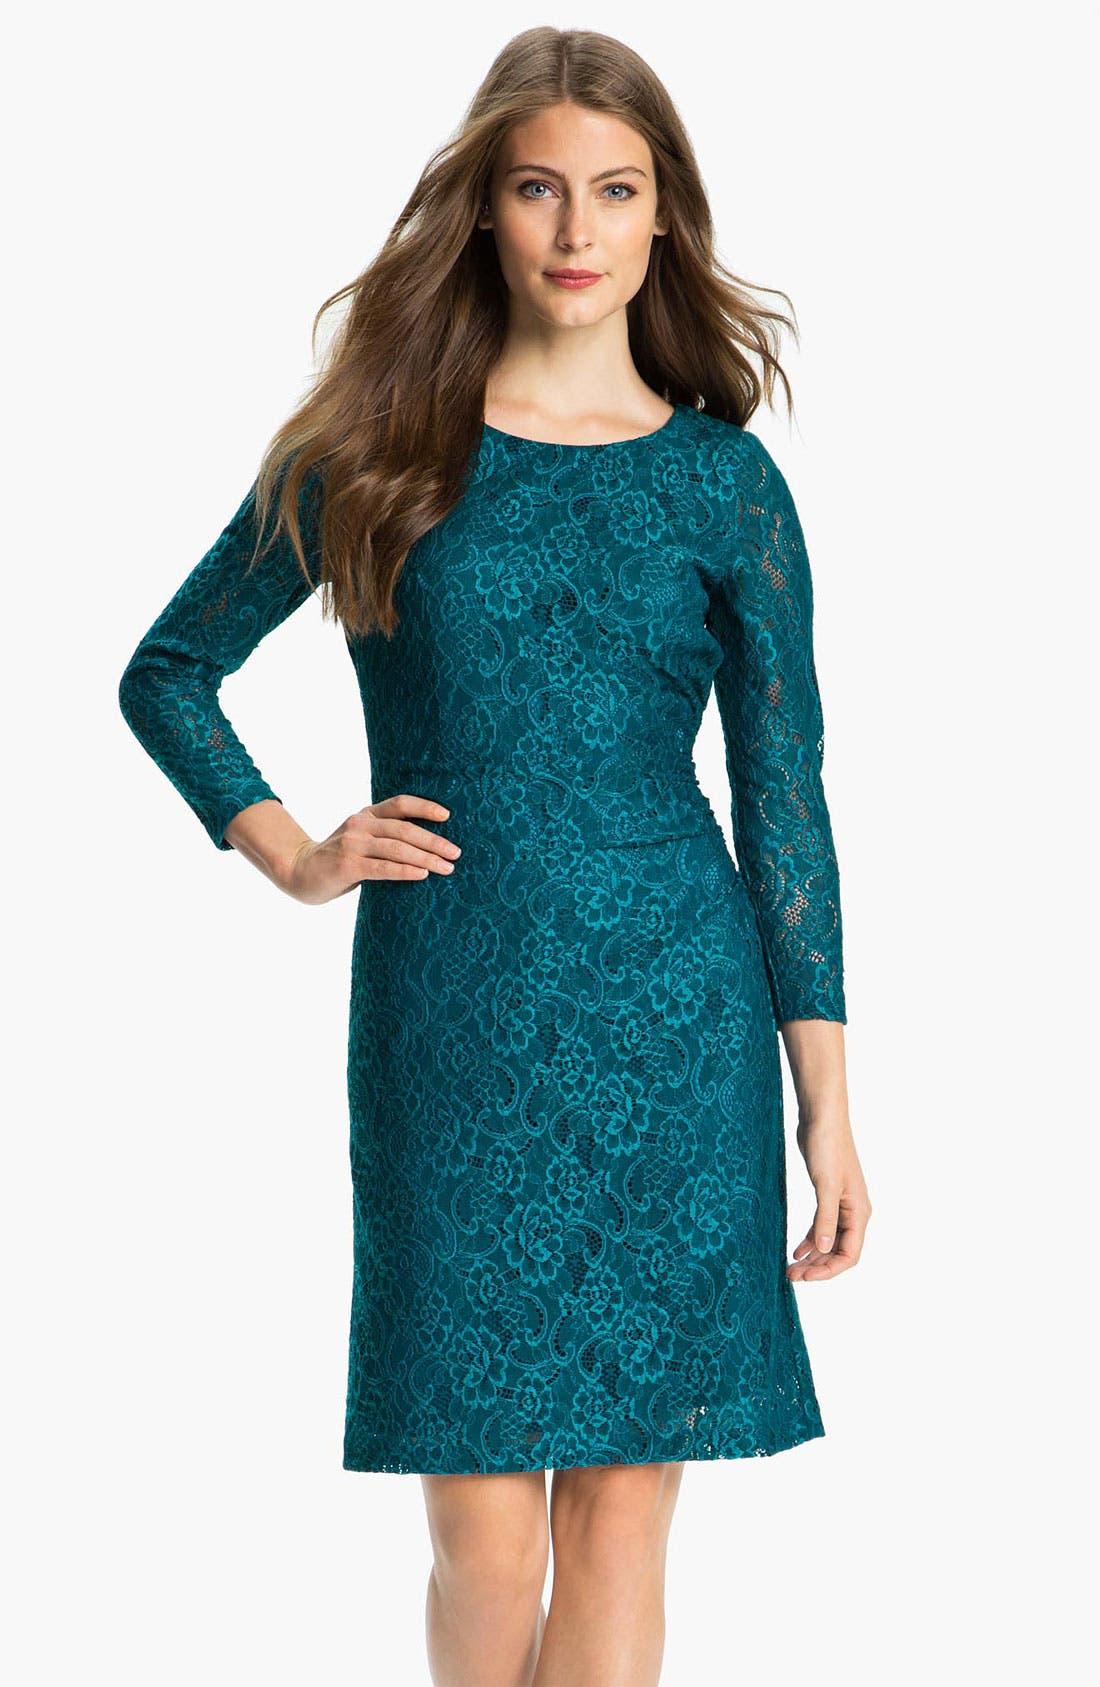 Alternate Image 1 Selected - Tahari Stretch Lace Dress (Petite)